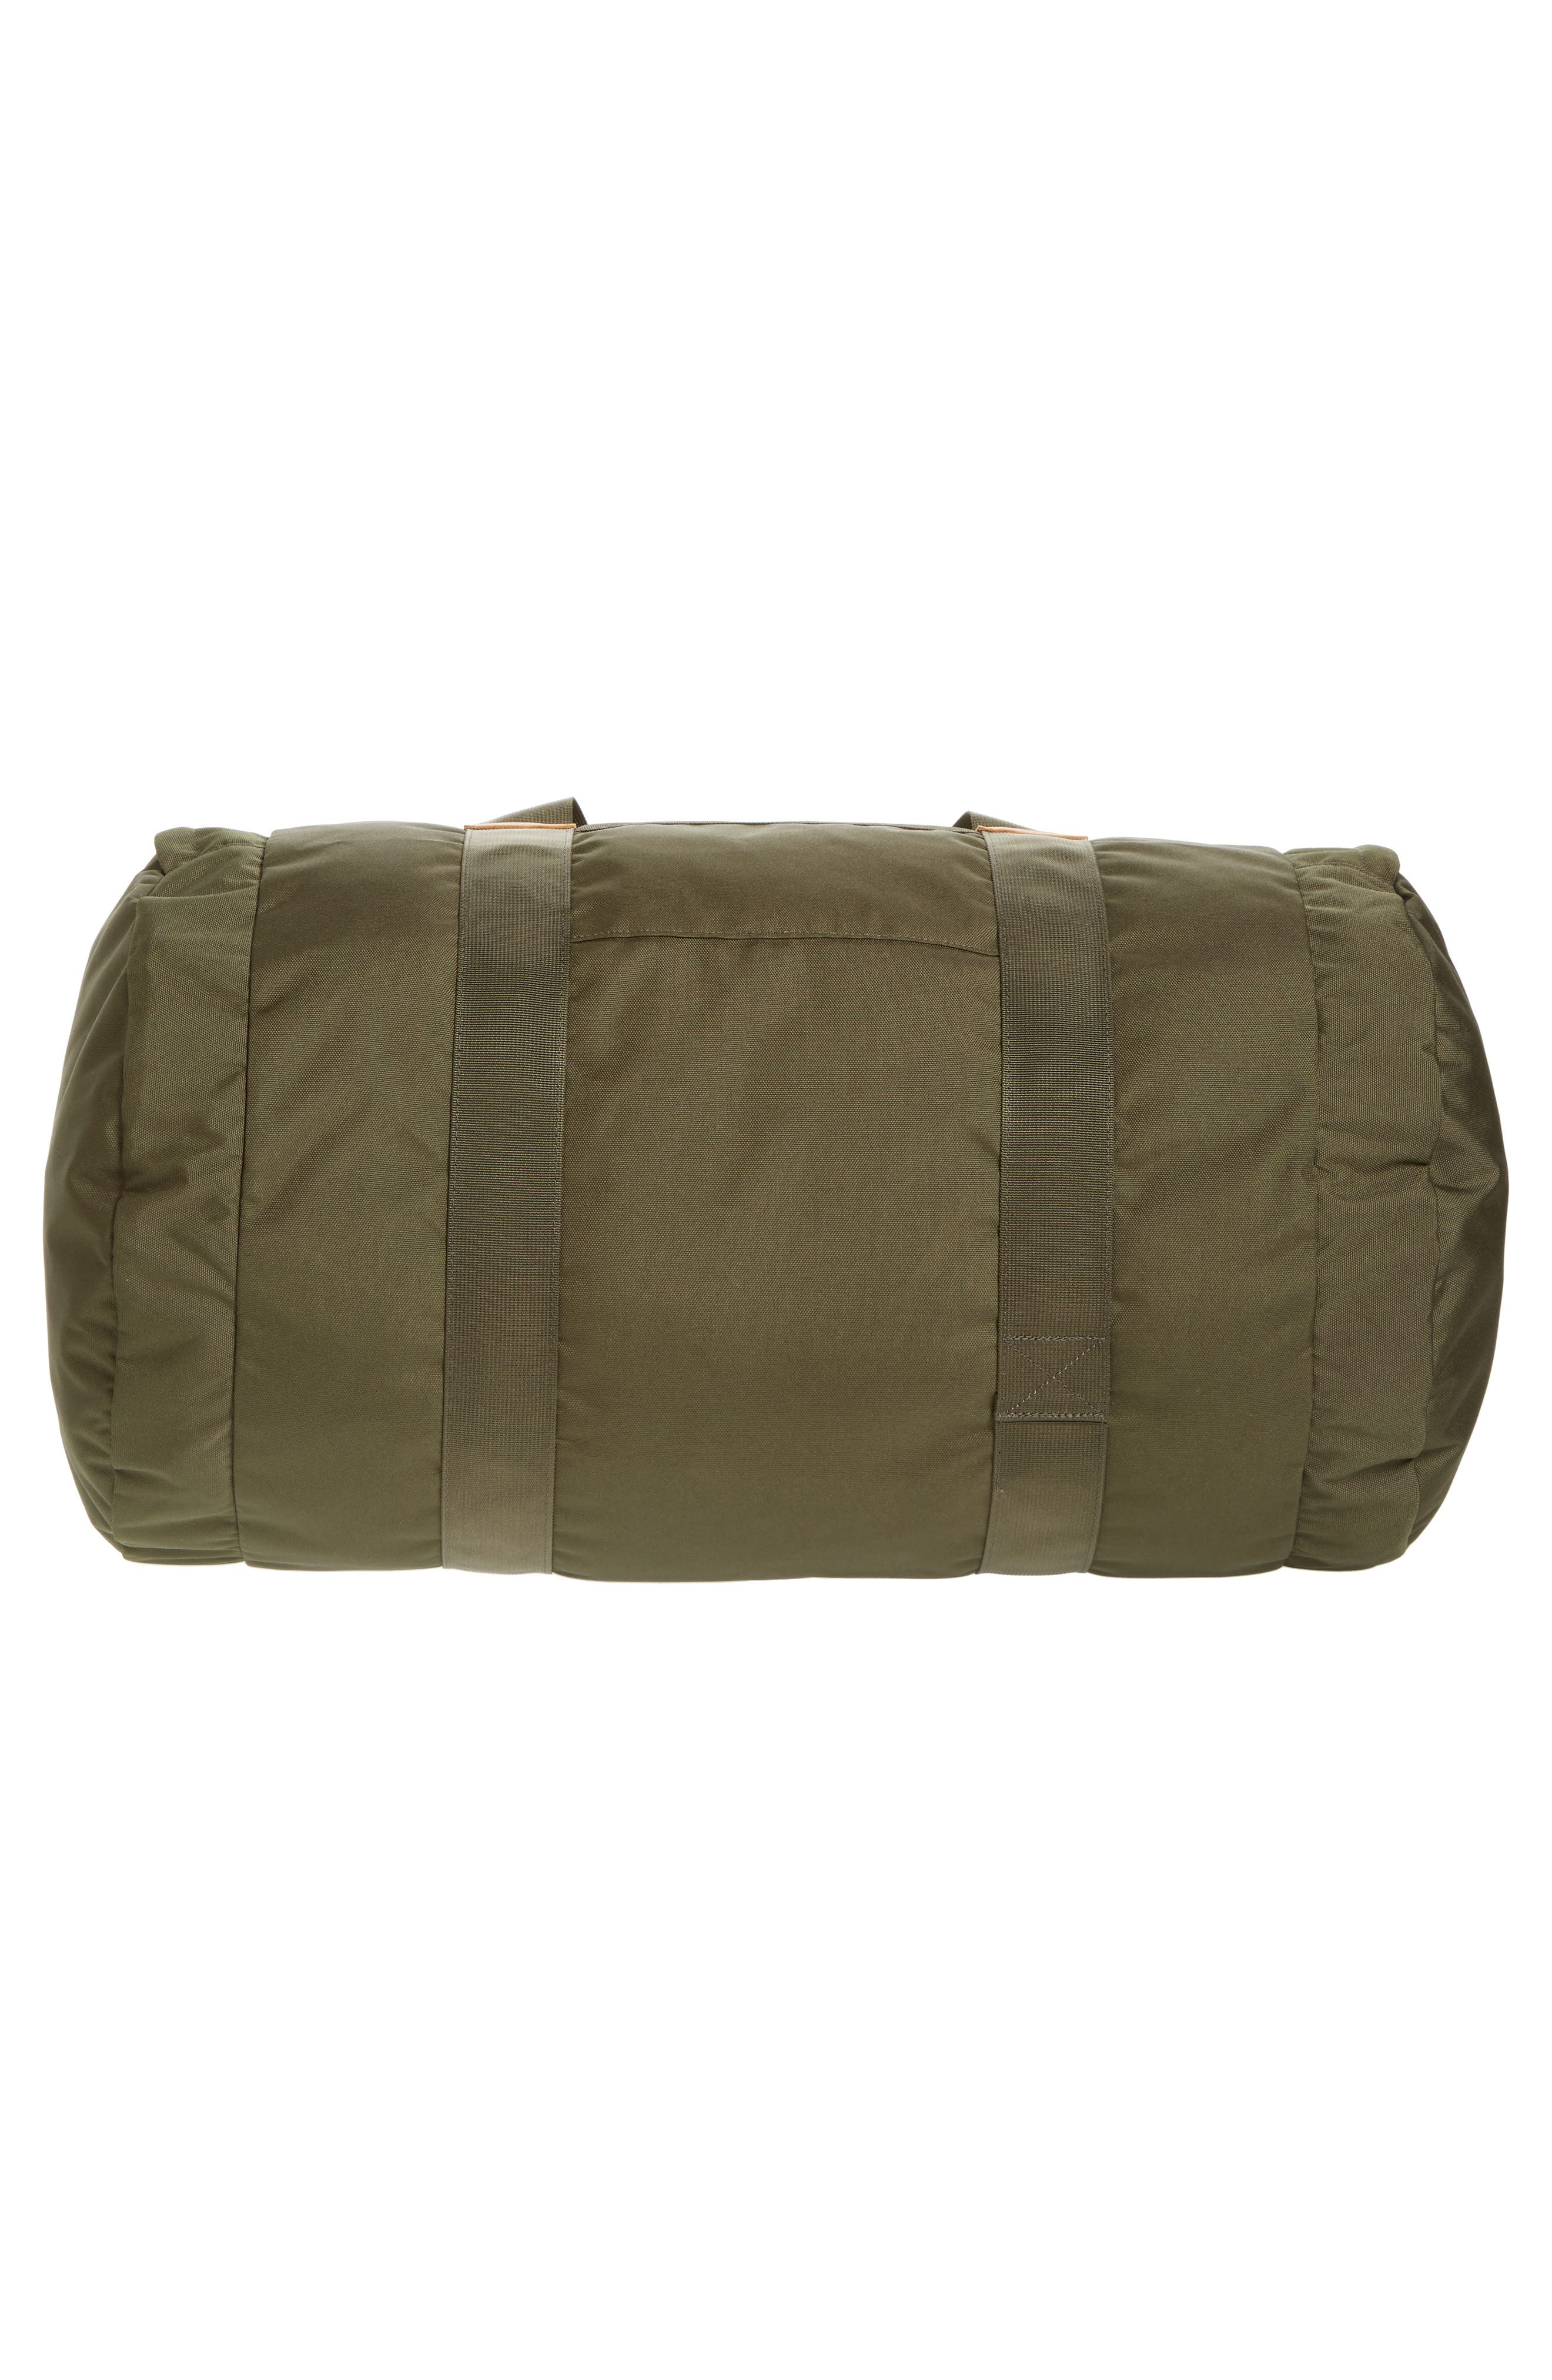 Arc Duffel Bag,                             Alternate thumbnail 6, color,                             Olive